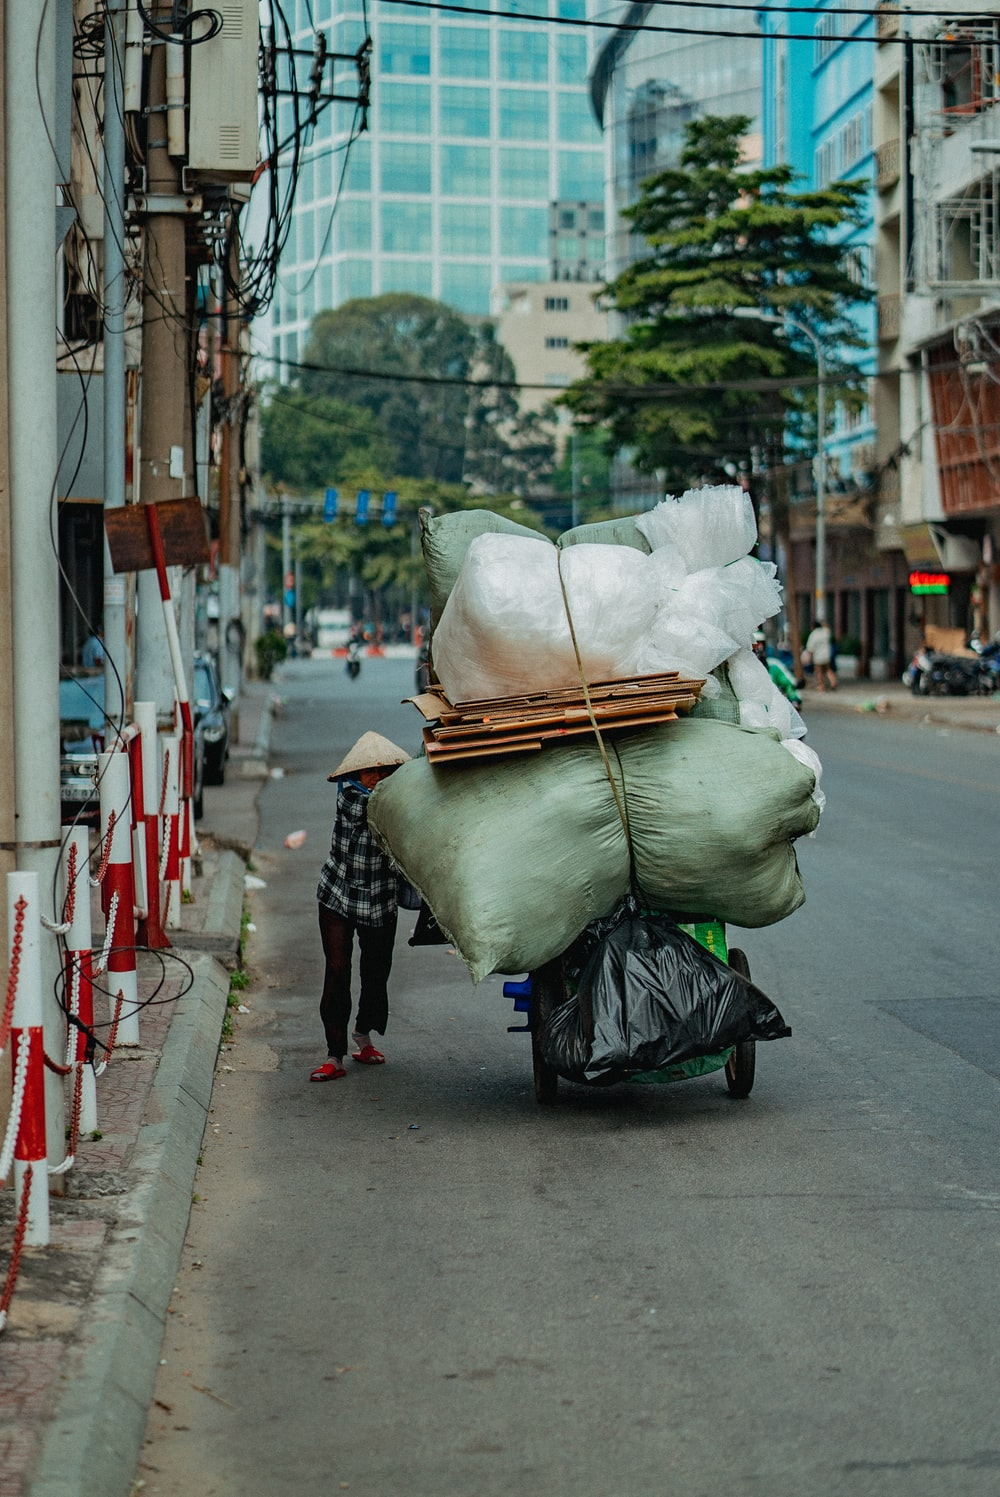 white plastic bags on sidewalk during daytime